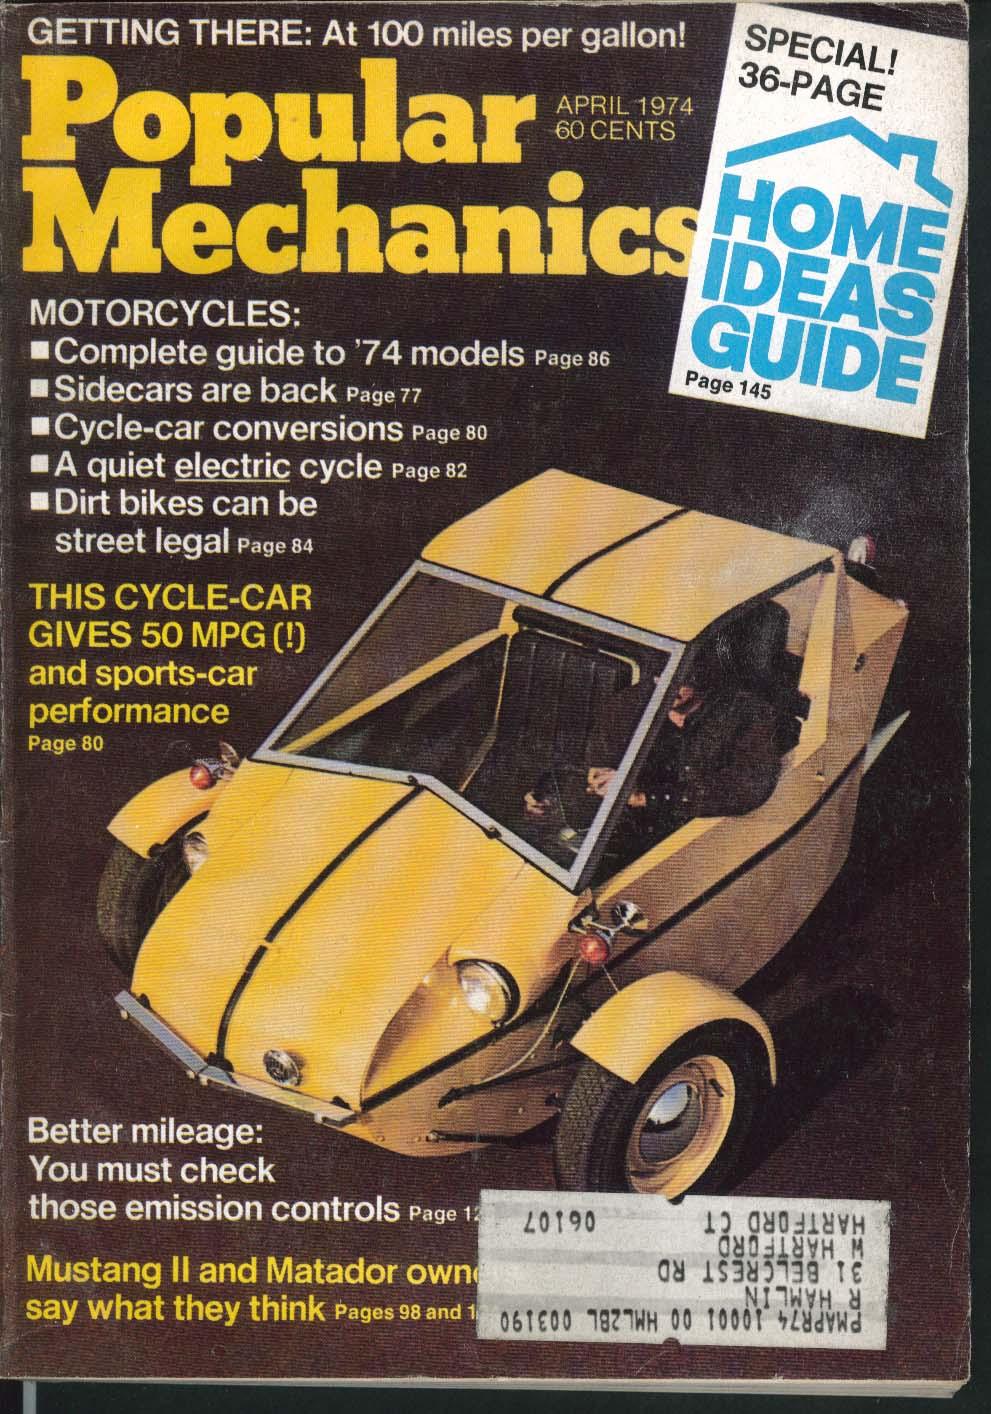 POPULAR MECHANICS Ford Mustang II AMC Matador owners reports 4 1974